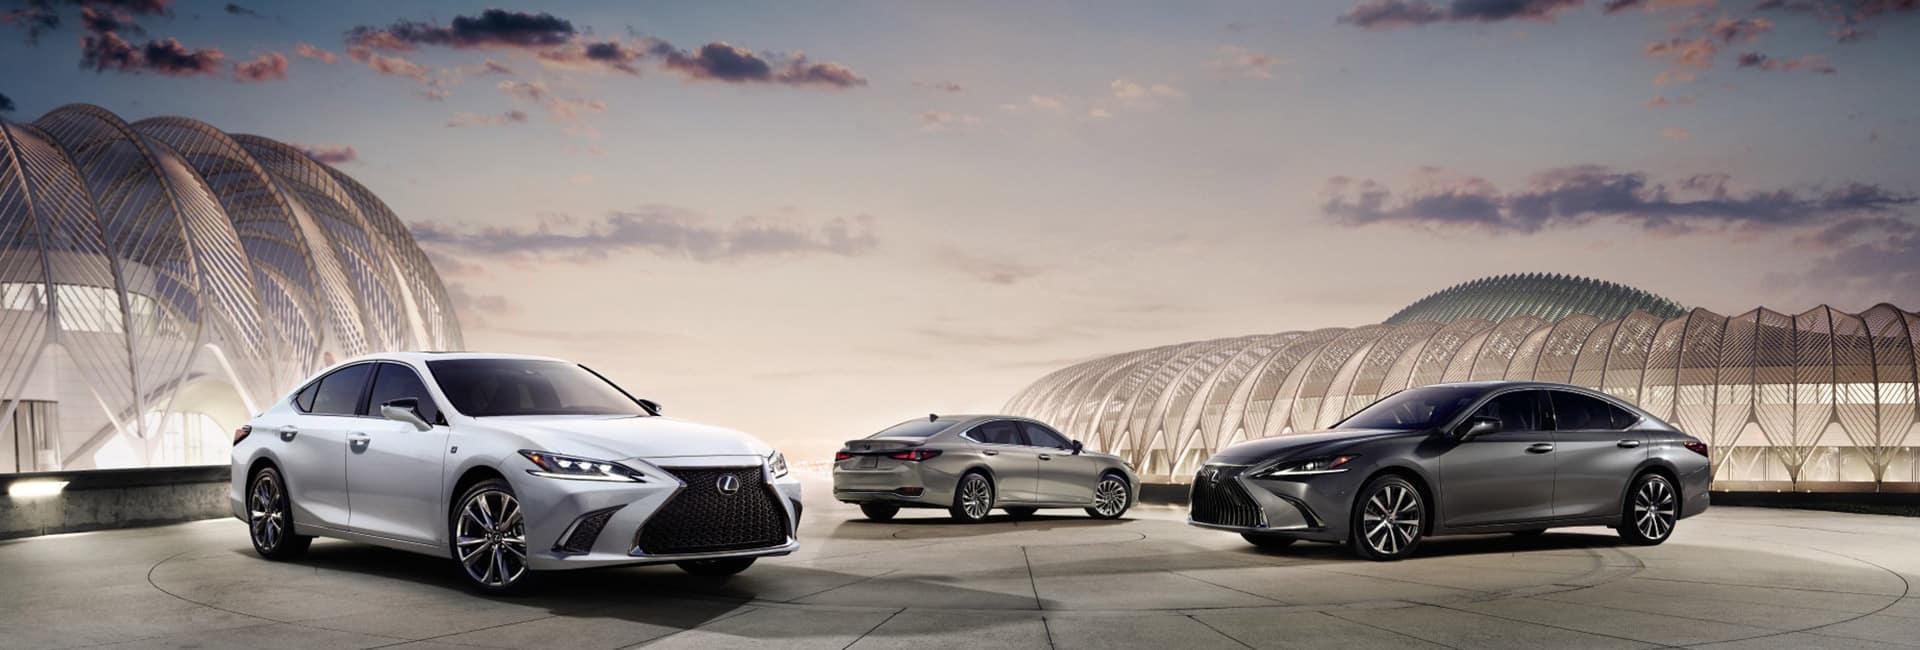 Lexus ES Lexington KY